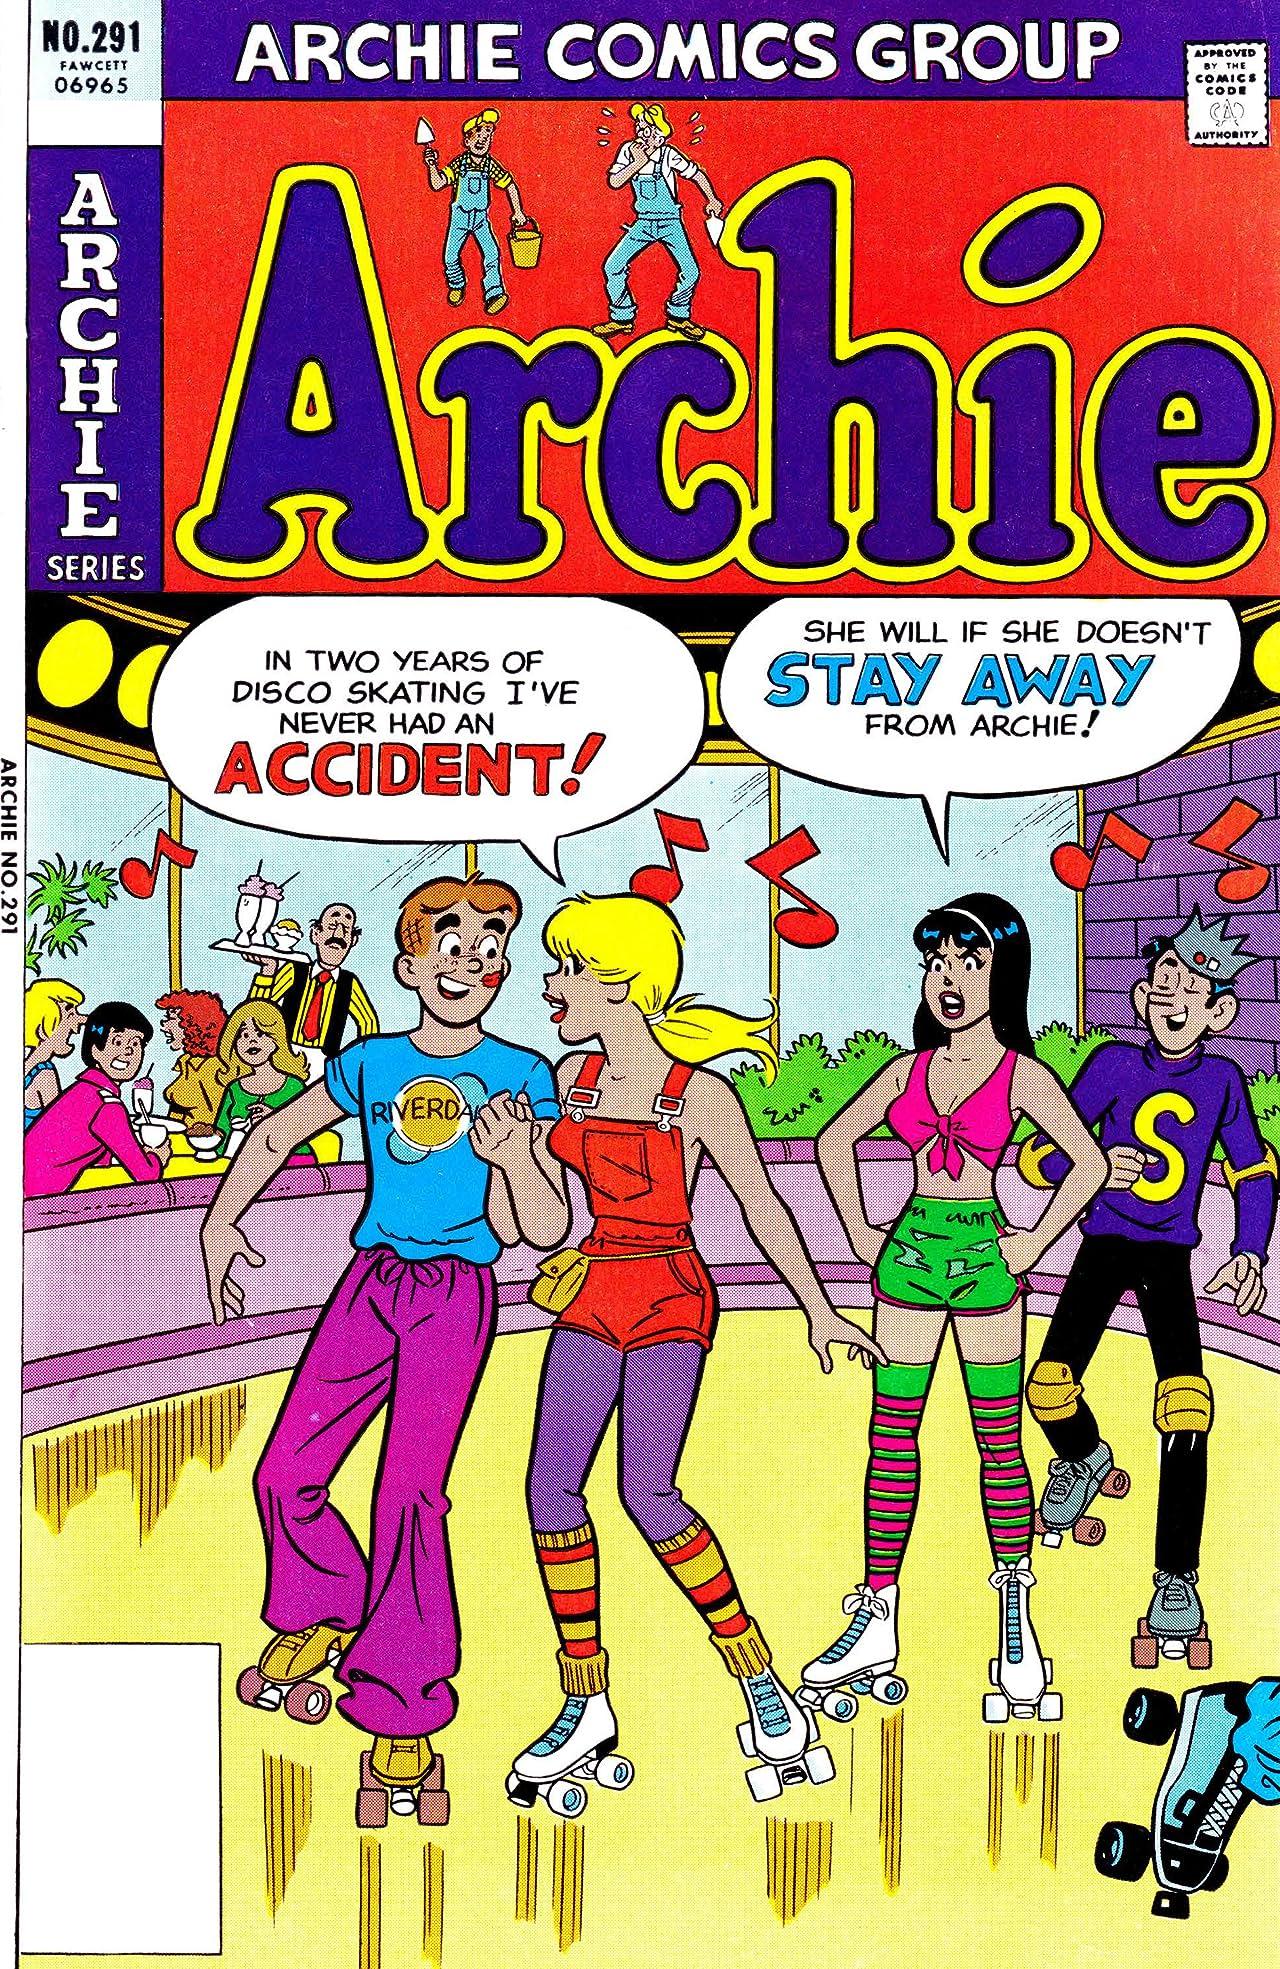 Archie #291